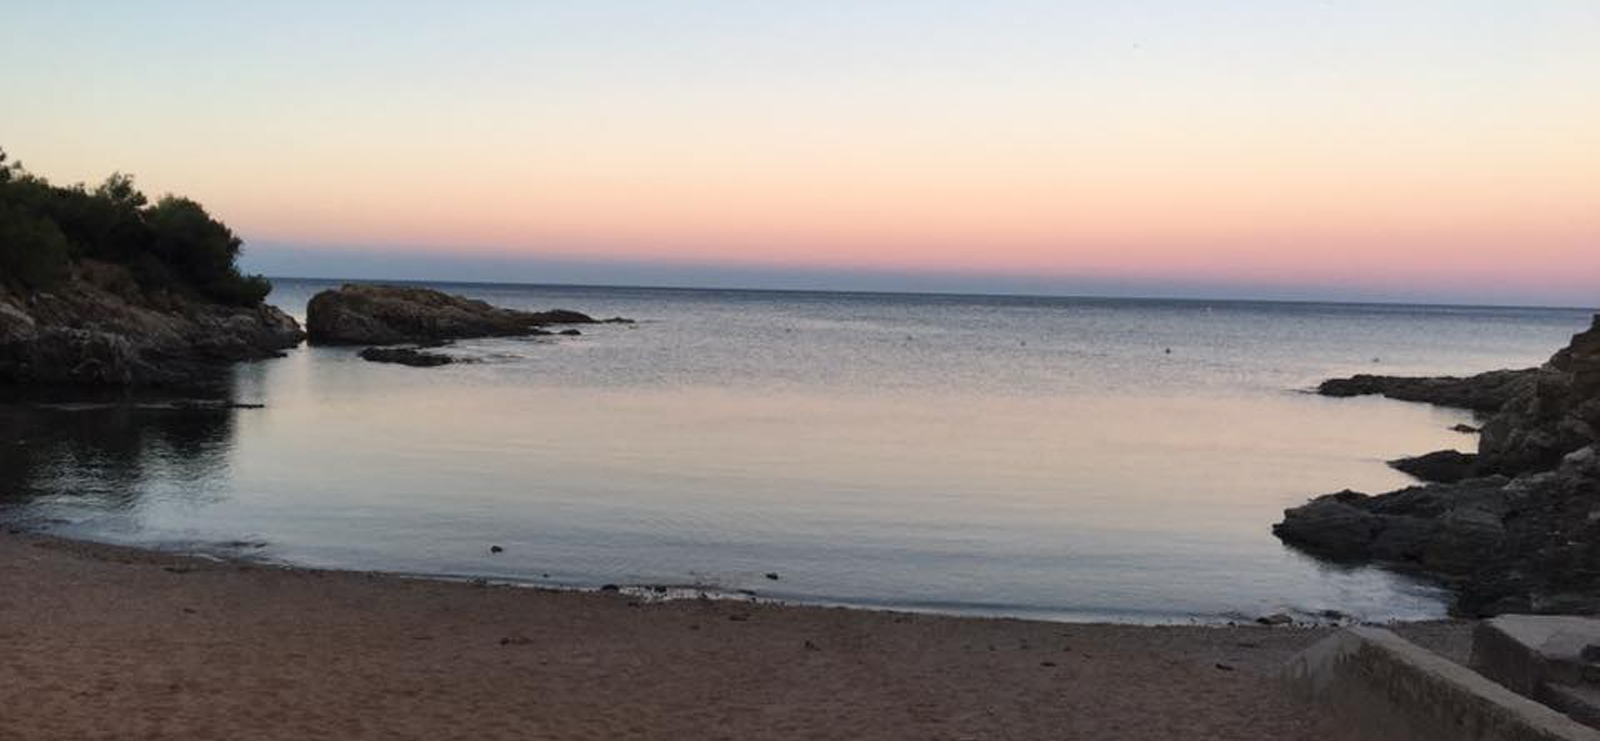 Calanque Tardieu (sunrise)